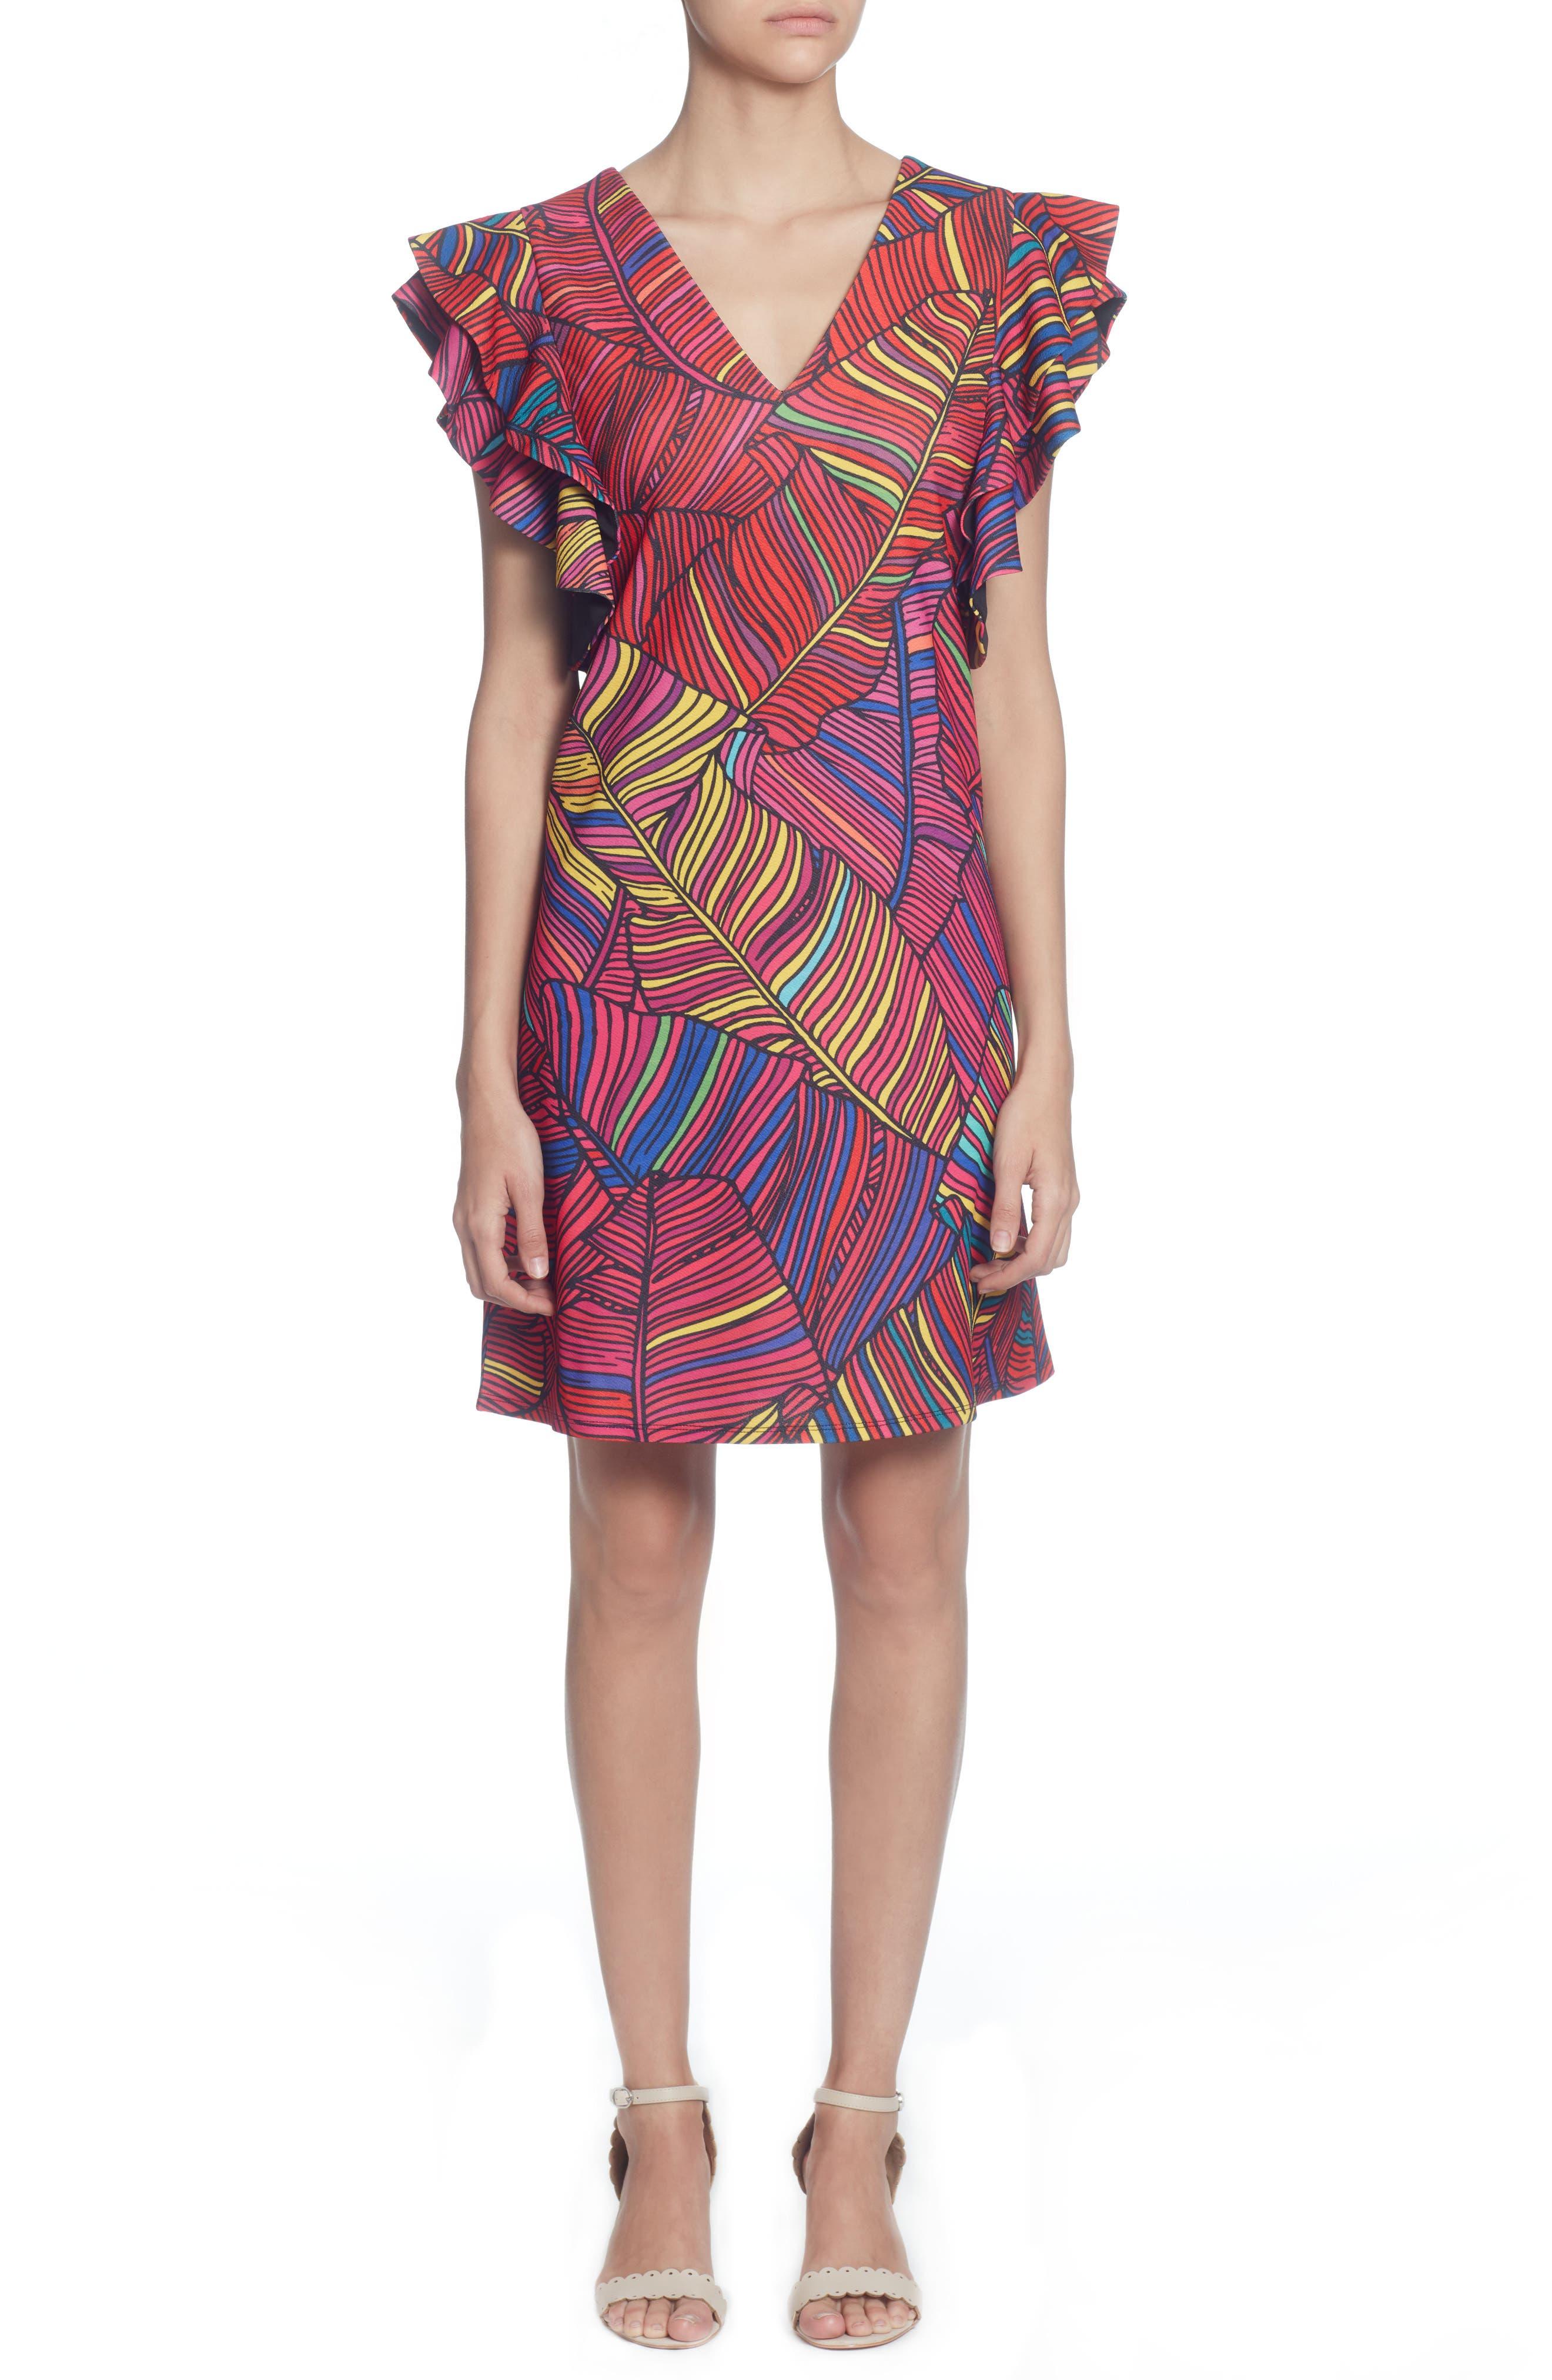 Catherine Catherine Malandrino Sandrine Colorful Palm Print Dress, Red